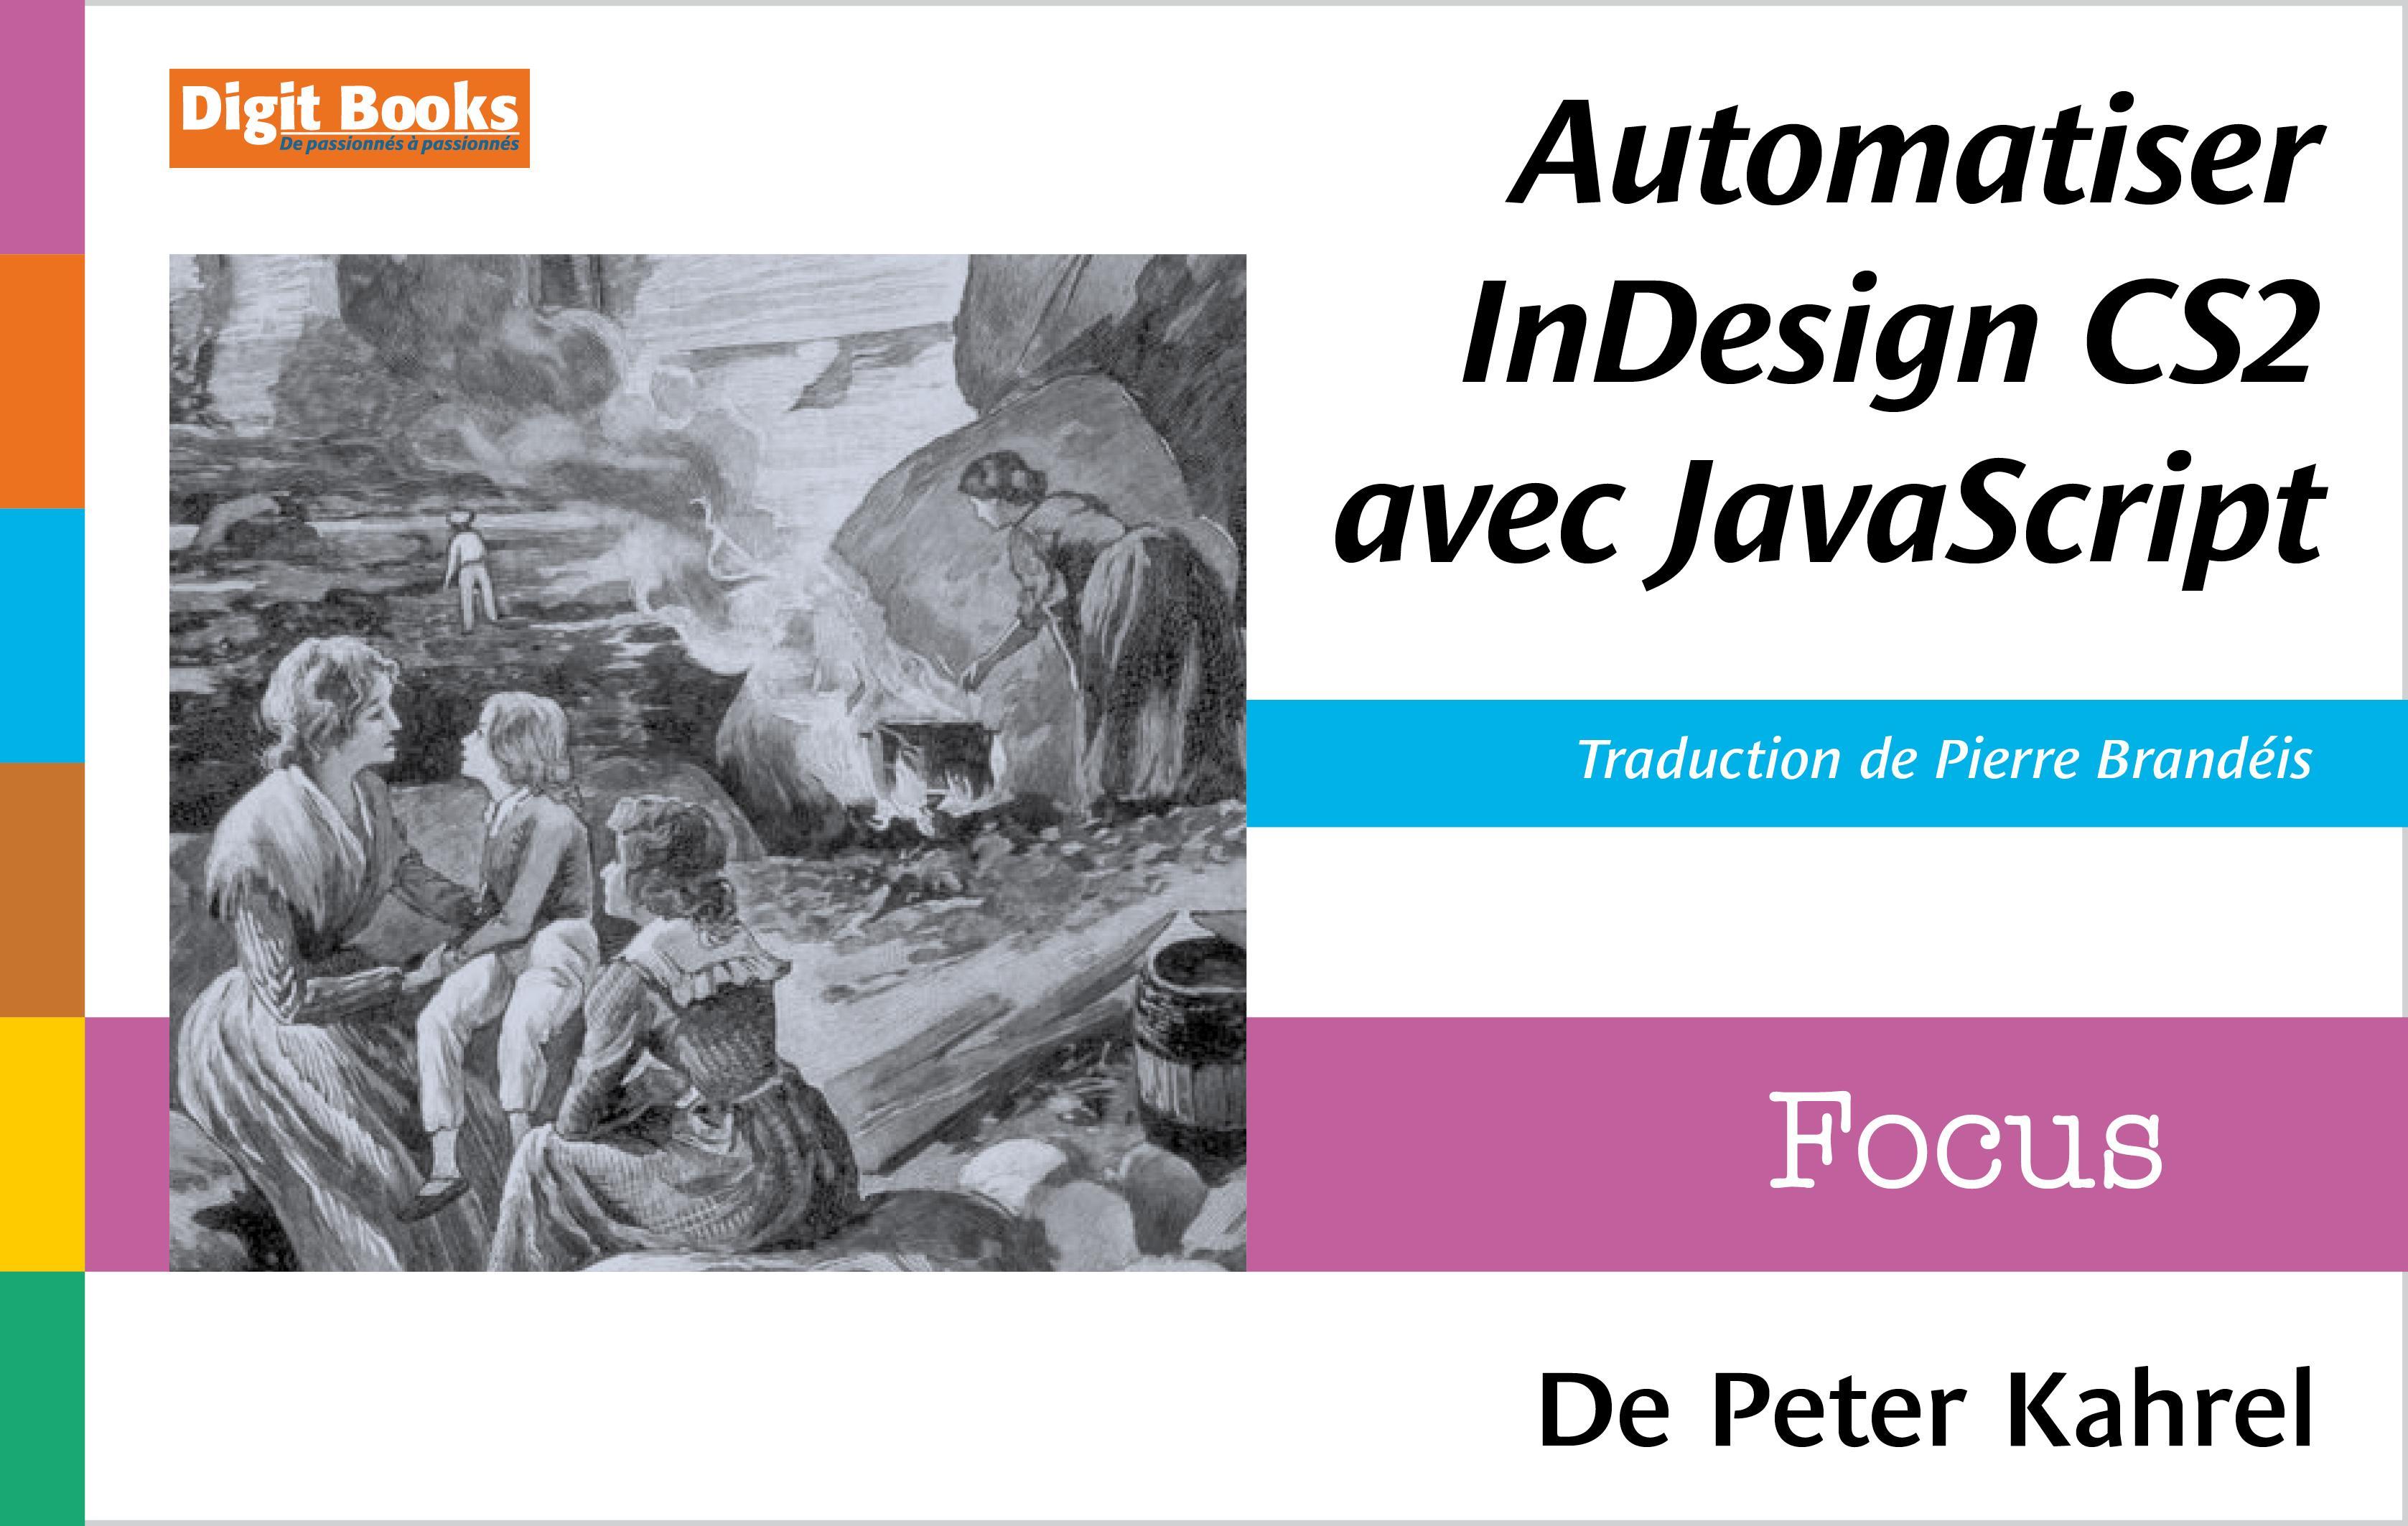 Automatiser InDesign CS2 avec JavaScript